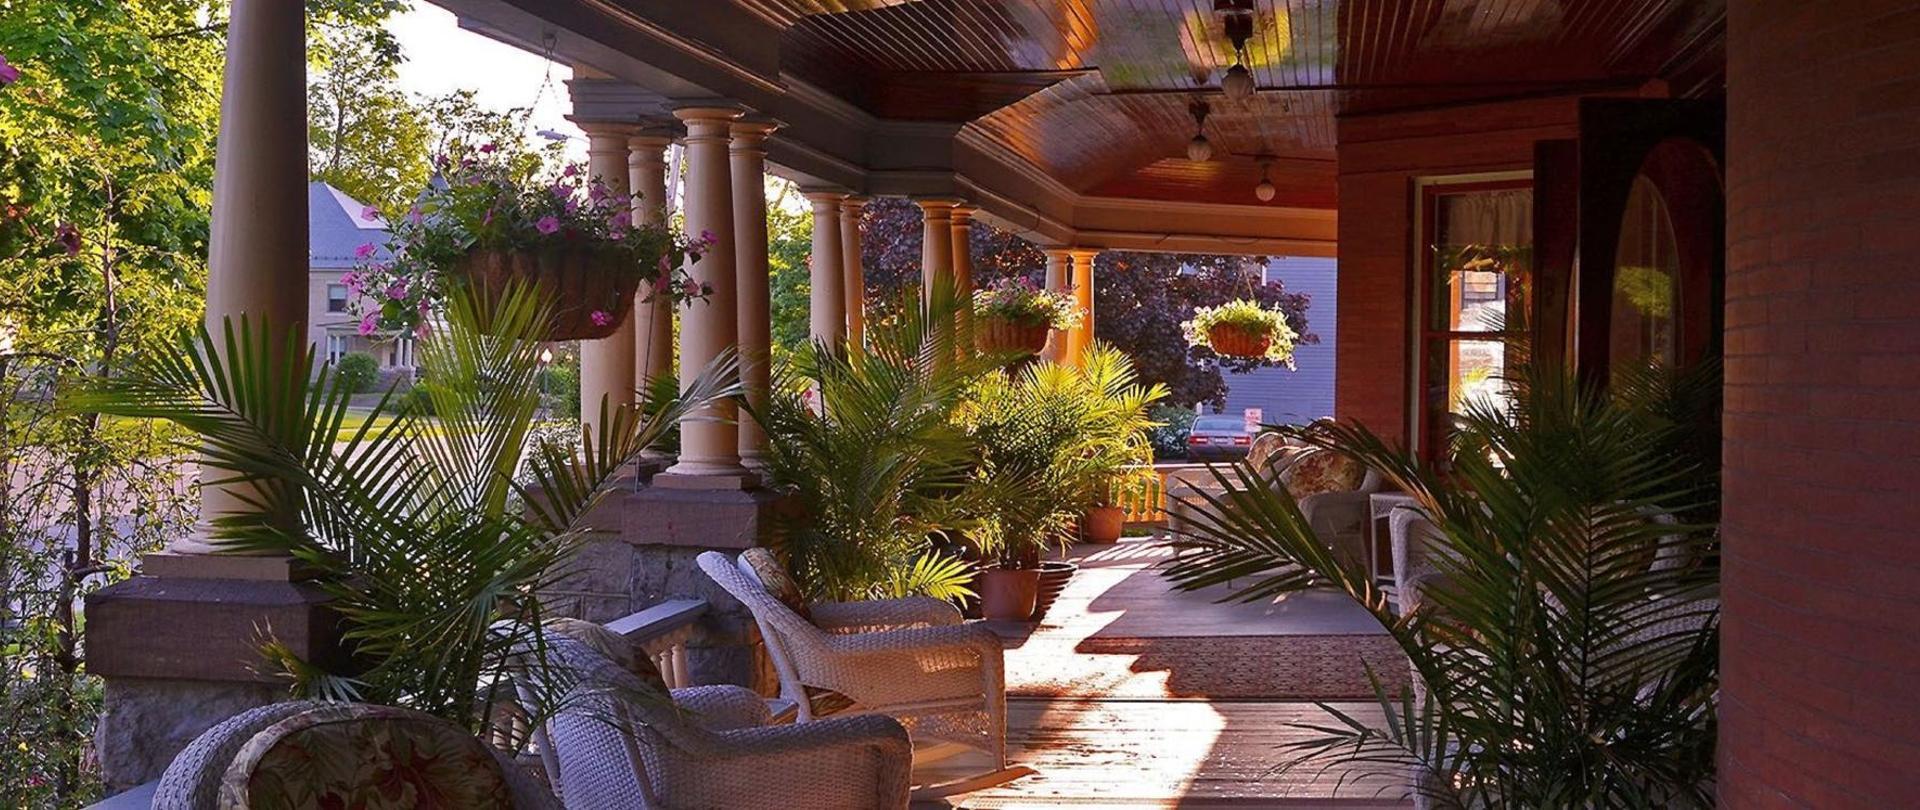 union-gables-porch-1.jpg